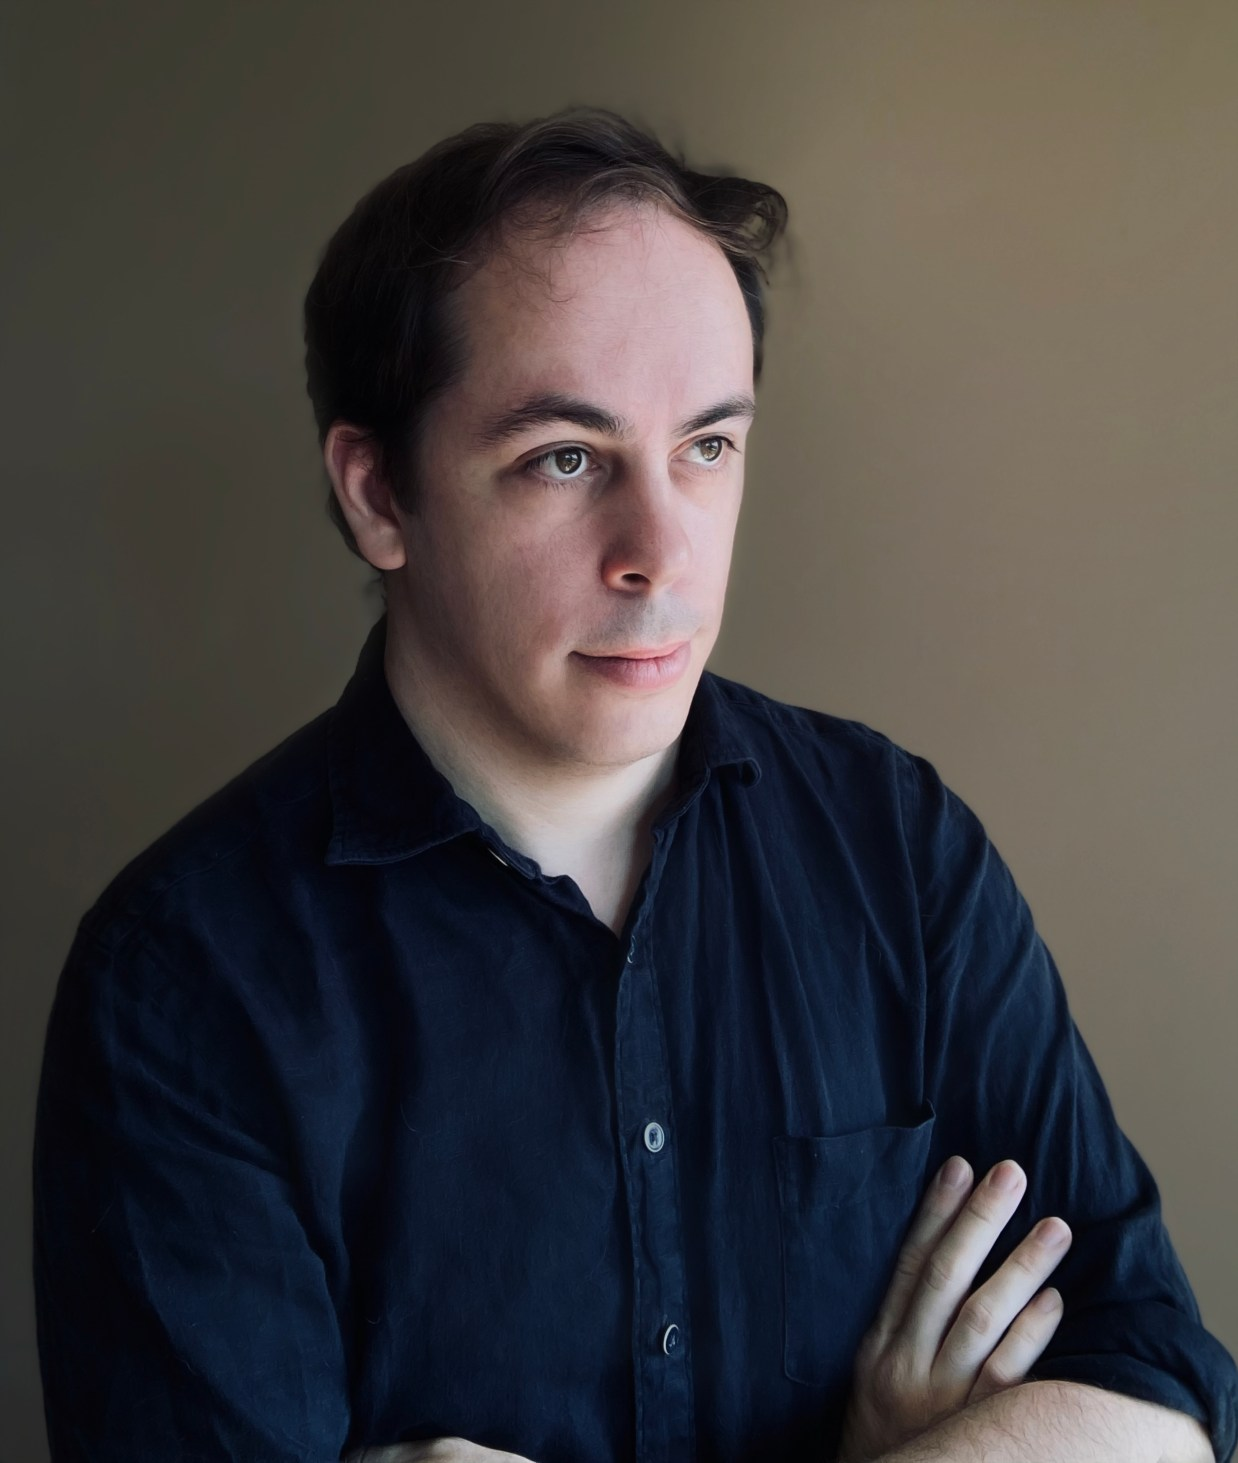 <strong>PHILIP EAMES - Composer</strong>